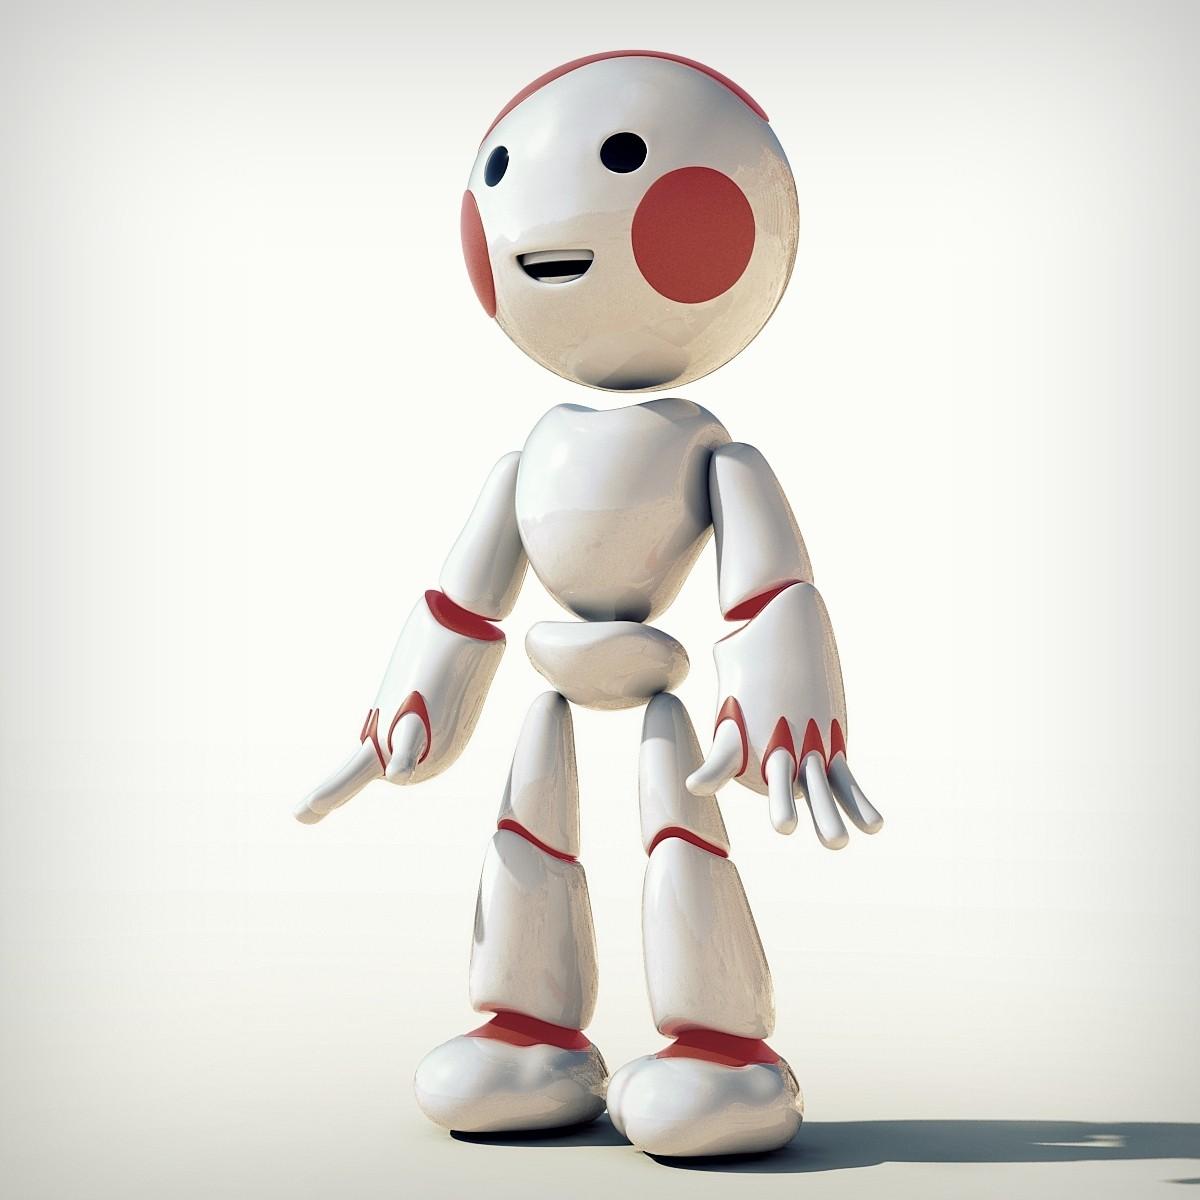 Render_Cartoon_Robot_04.JPG